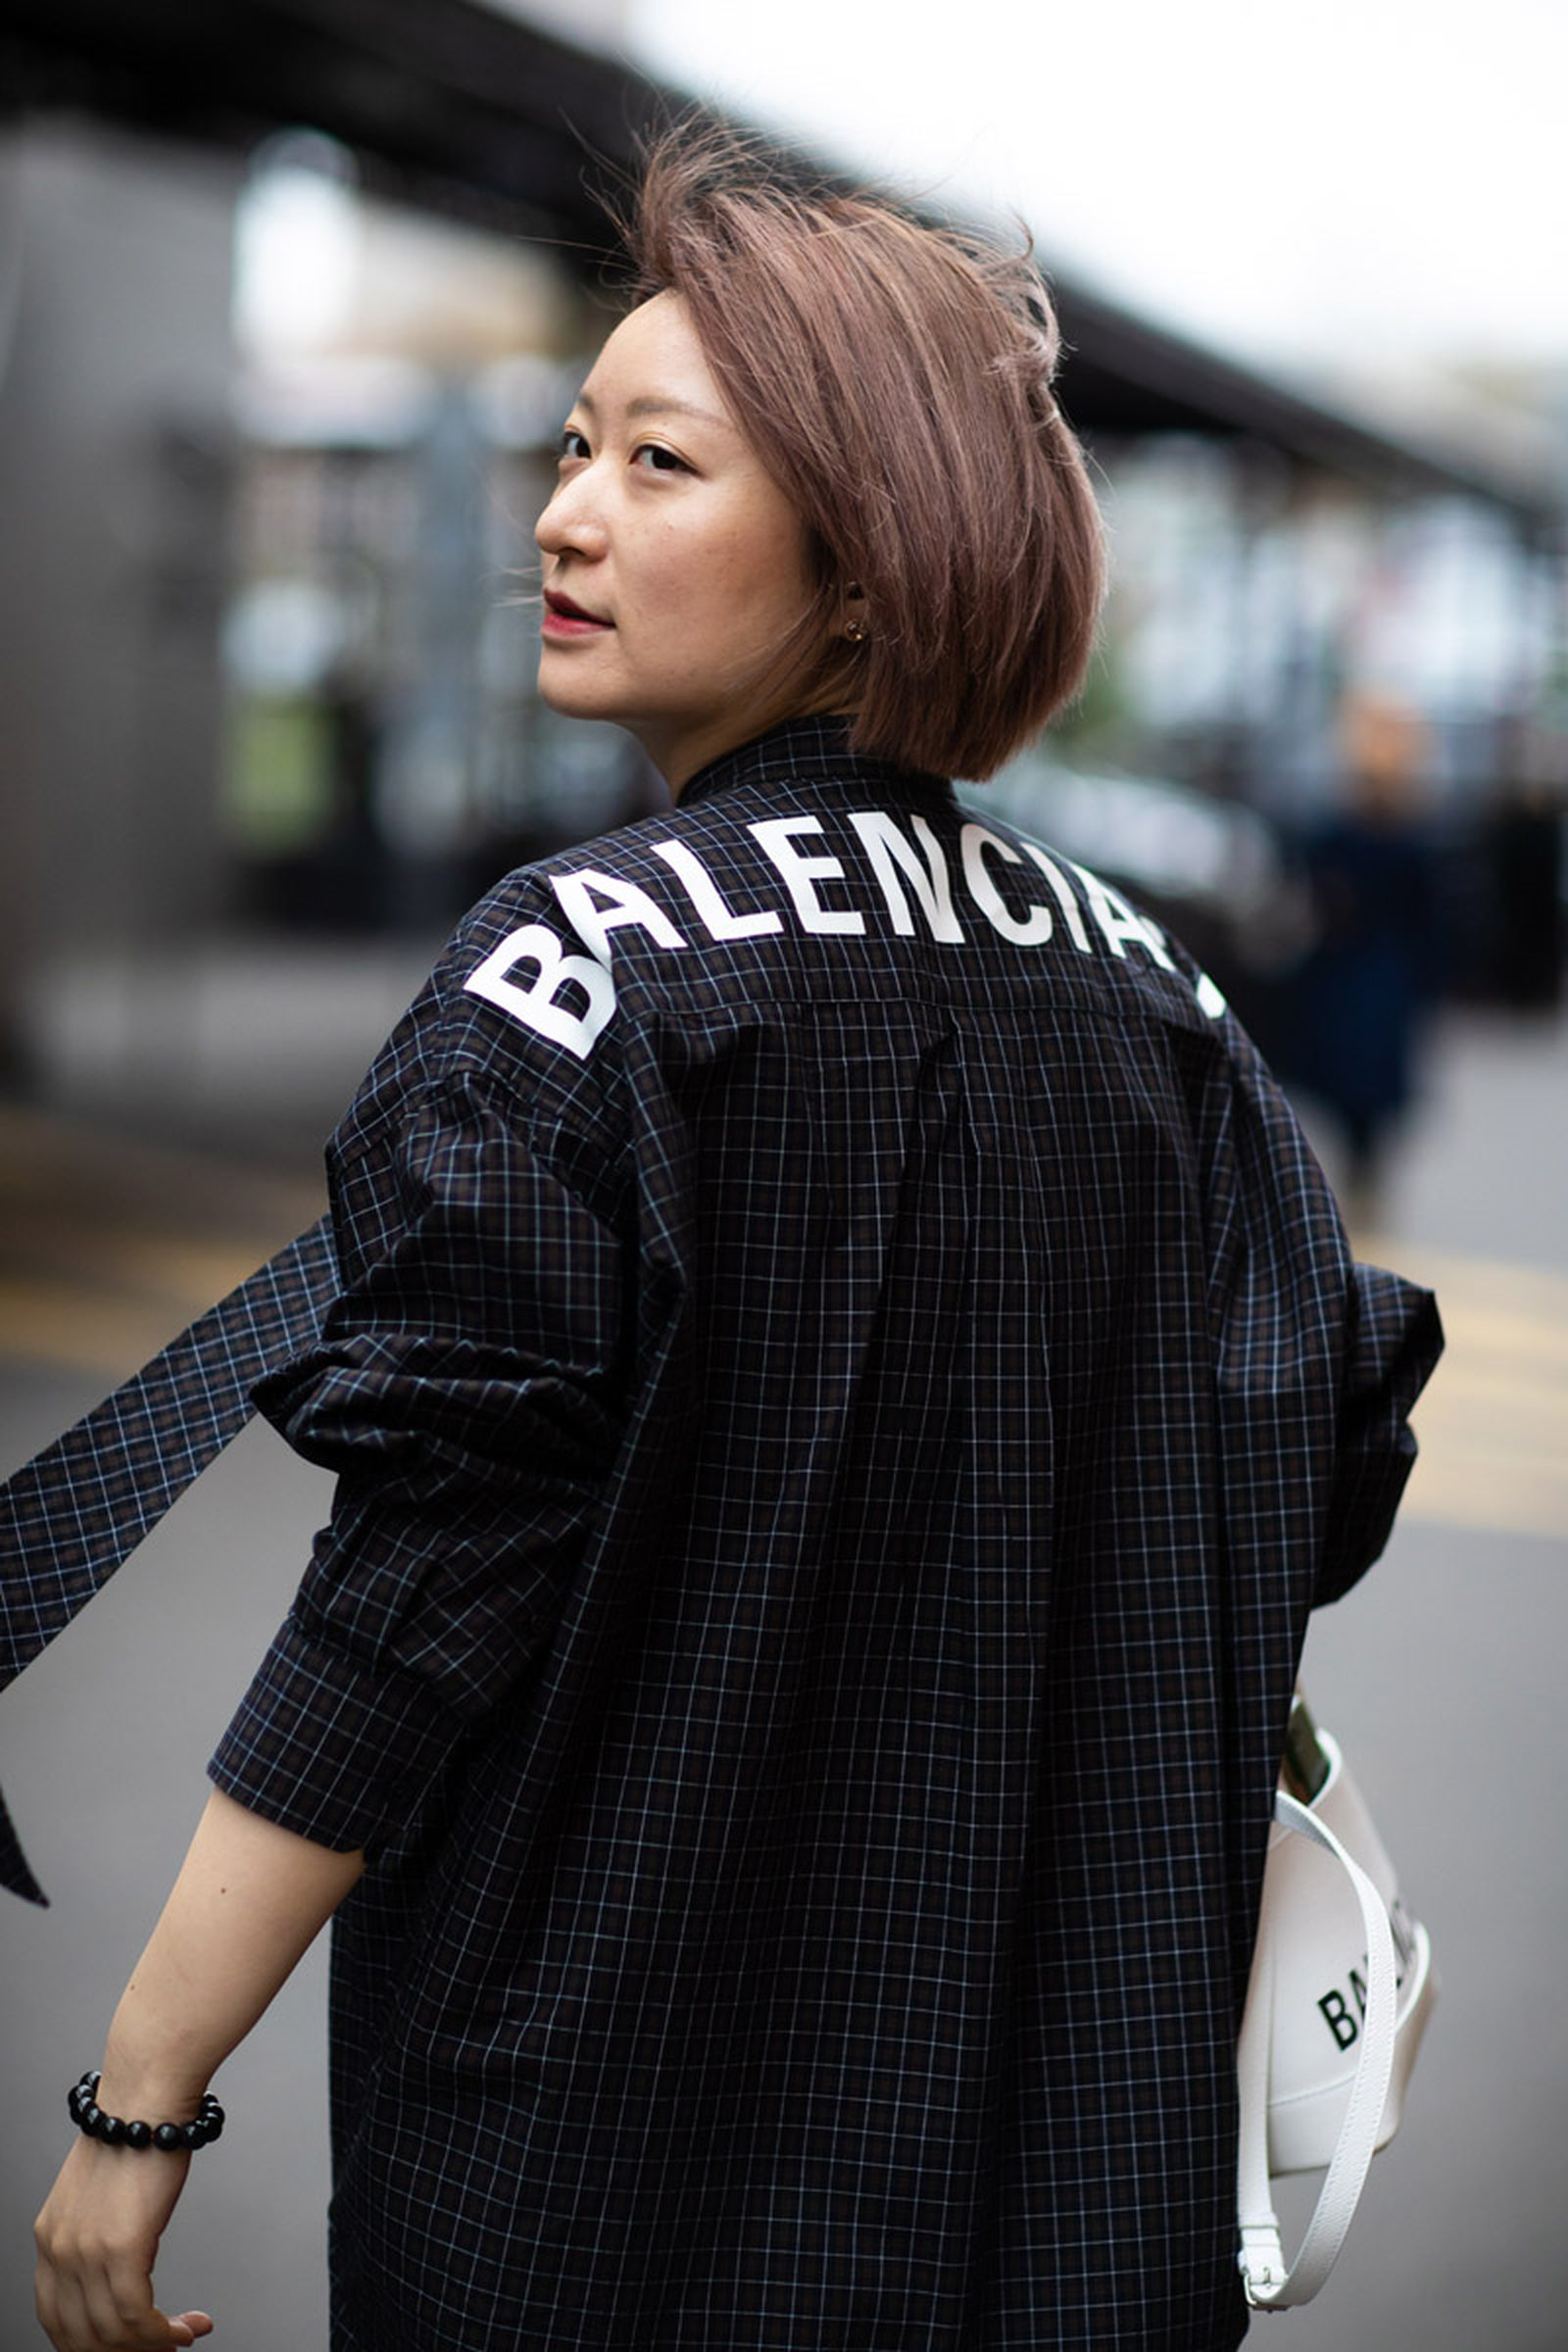 WFW19 Paris StreetStyle EvaAlDesnudo 09 Balenciaga Demna Gvaslia